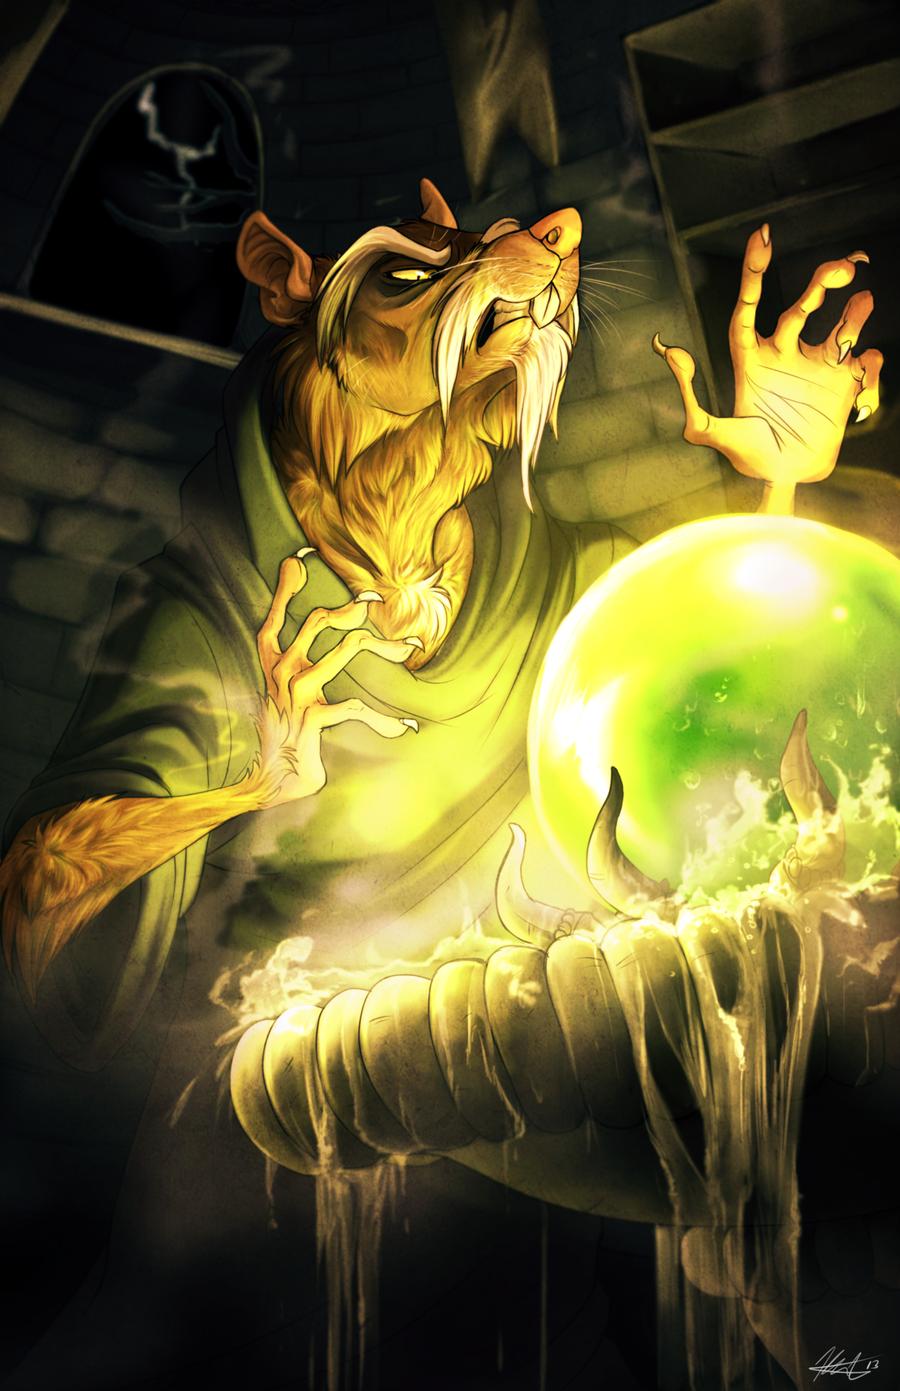 Somesort of Sorcery by AeroSocks